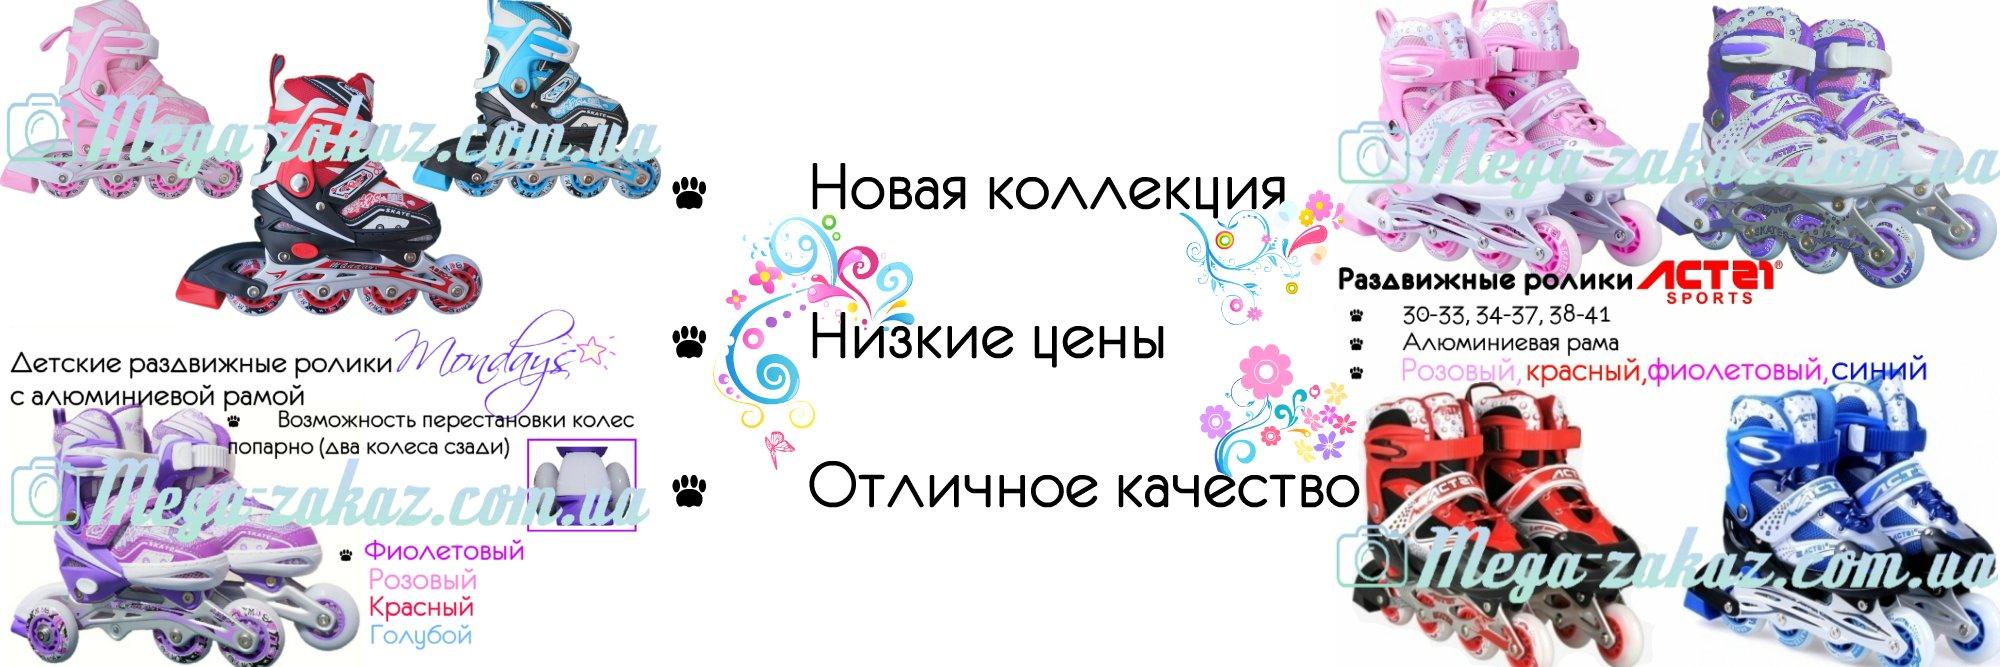 https://mega-zakaz.com.ua/images/upload/коллаж%20ролики.jpg